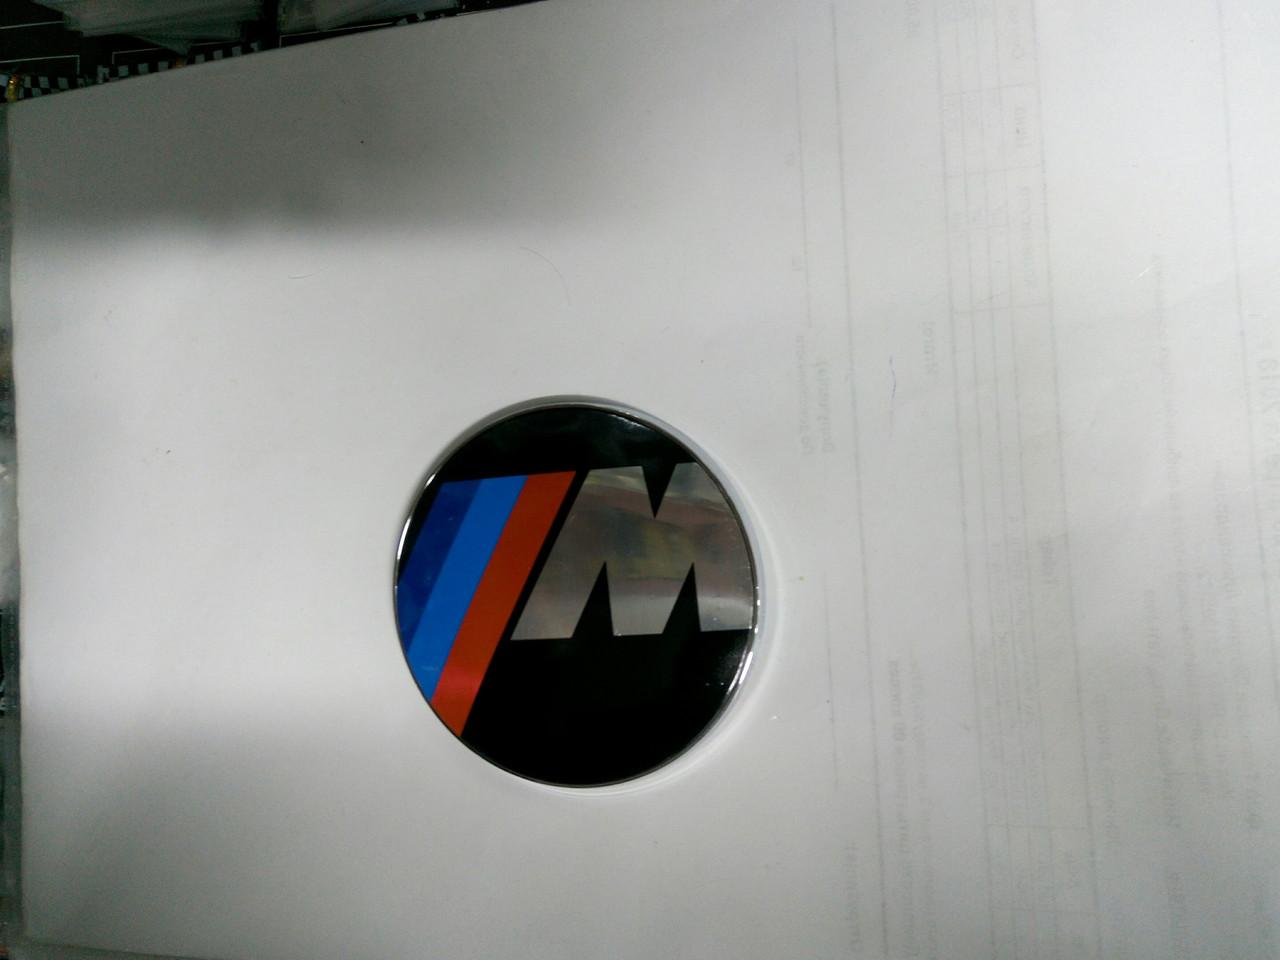 Эмблема BMW  83 мм верхняя часть